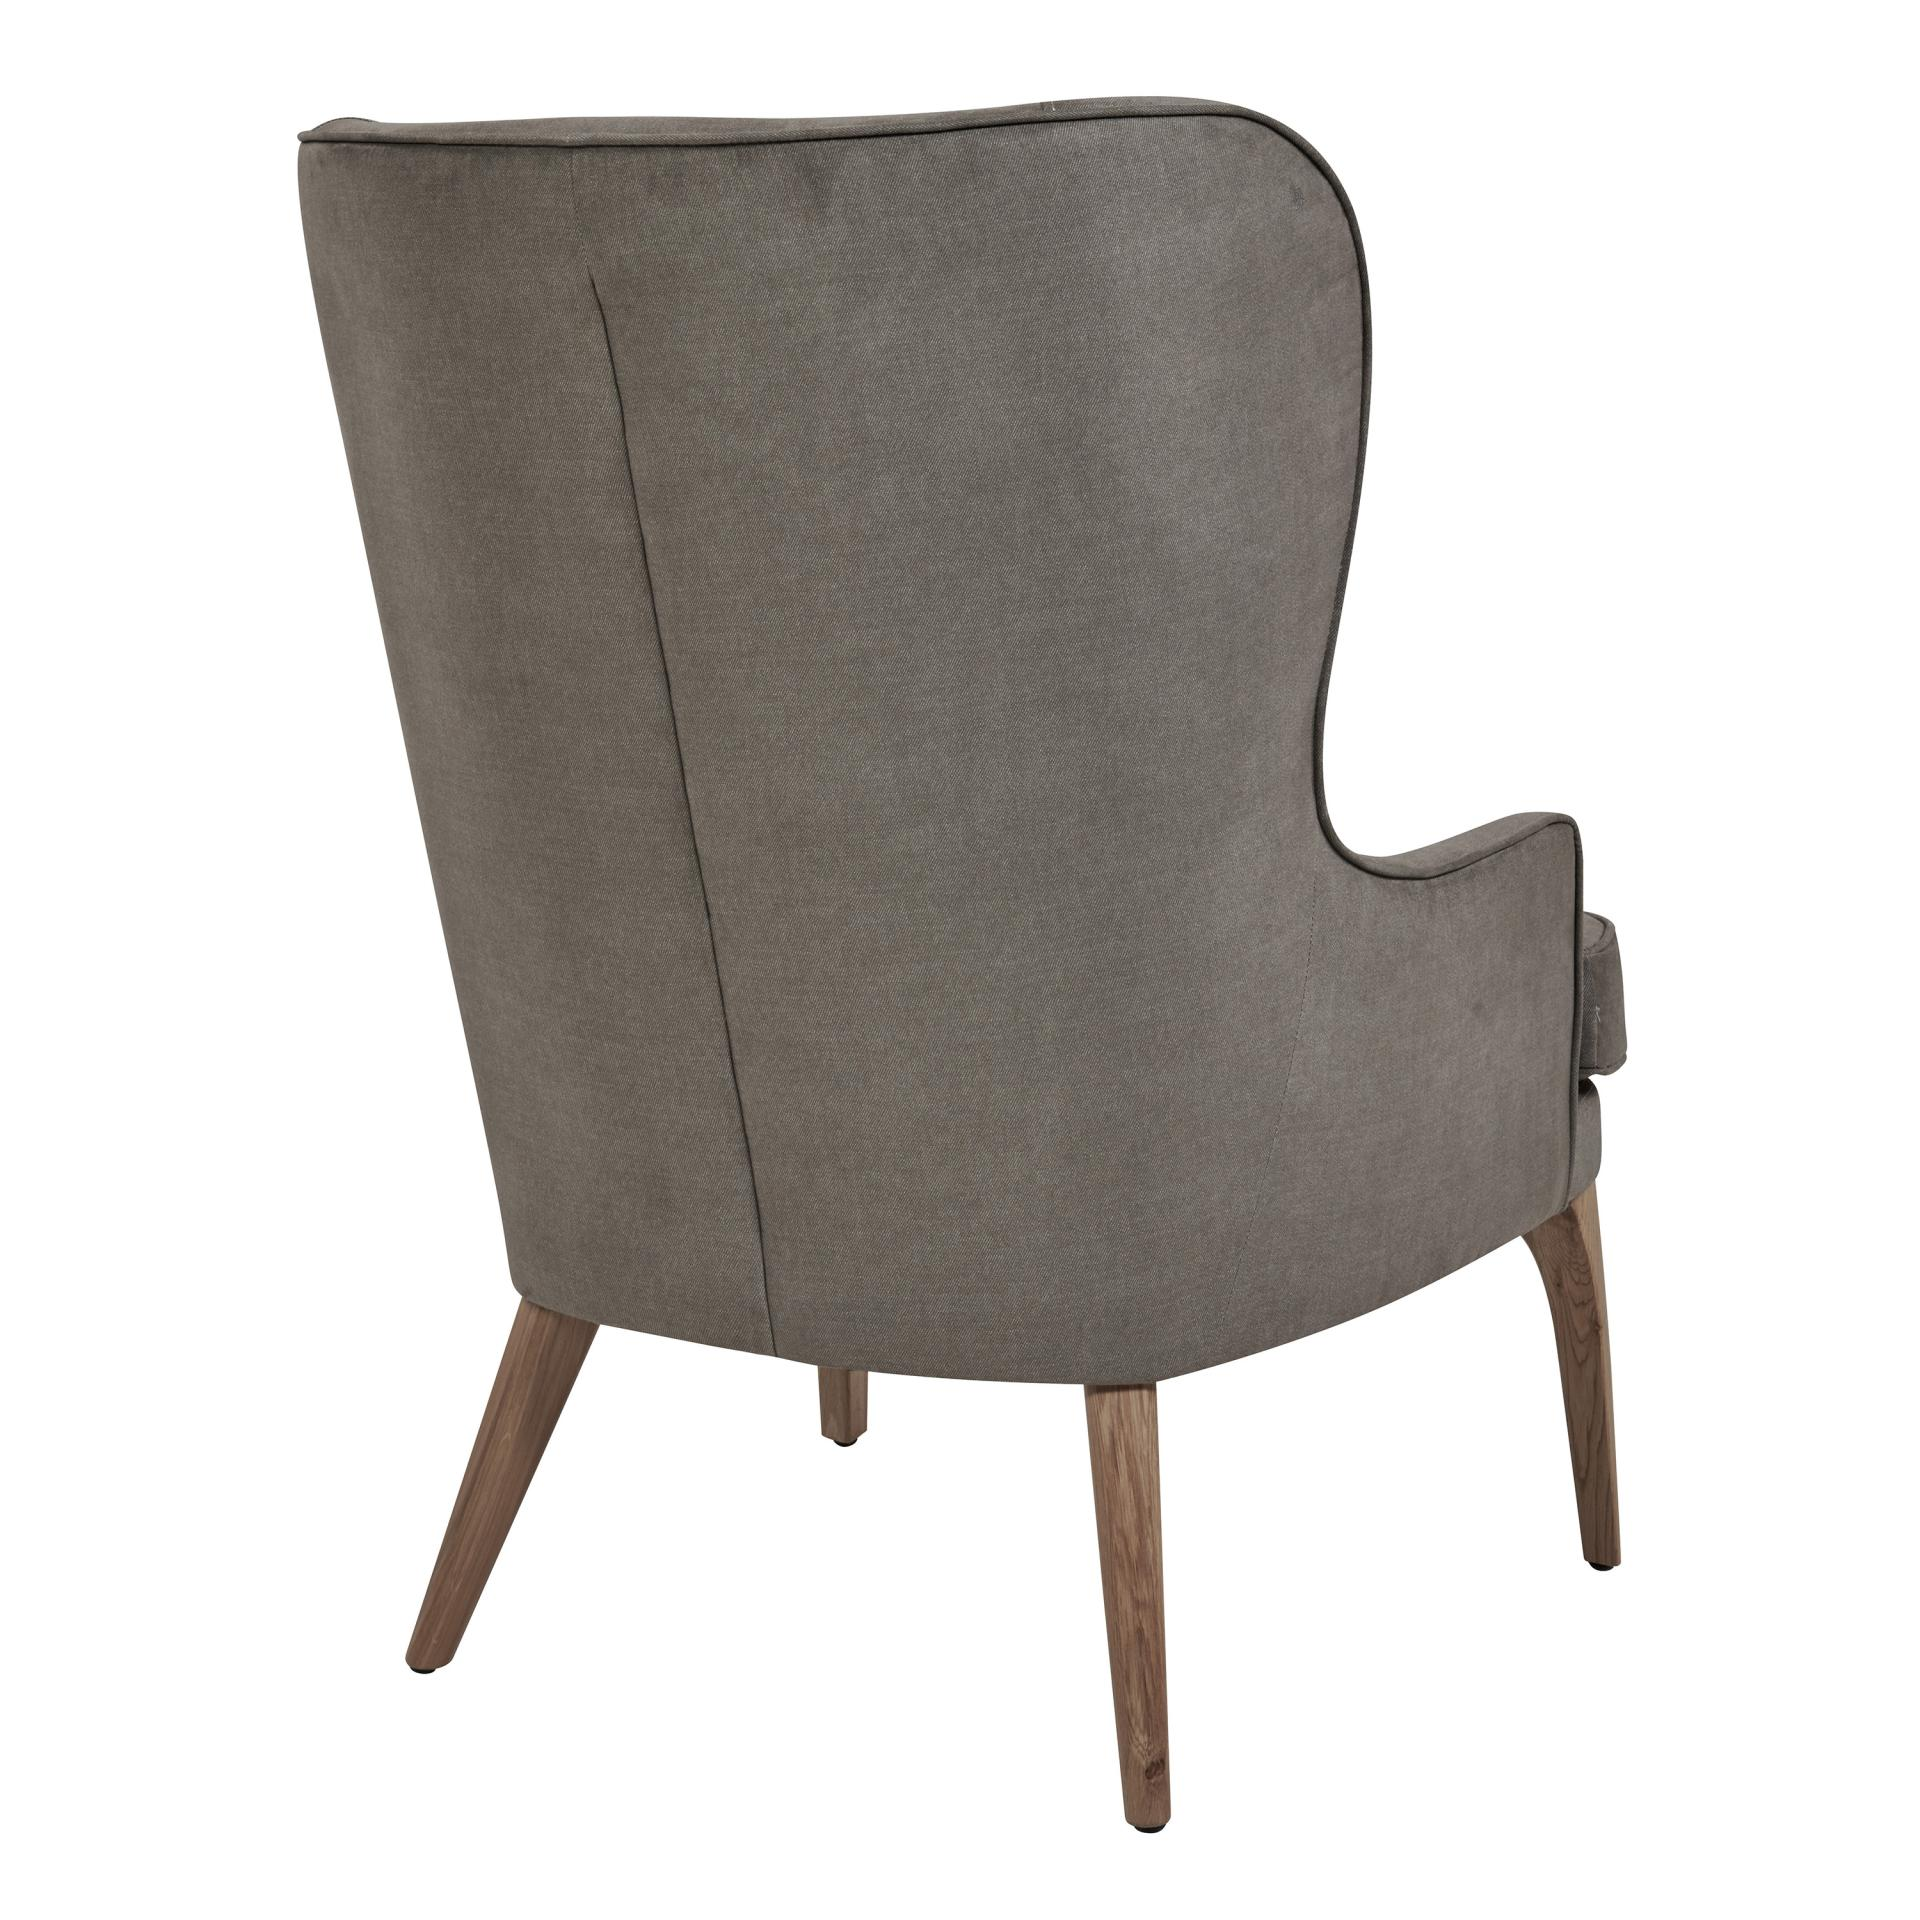 1900092 158 Npd Furniture Stylish Amp Affordable